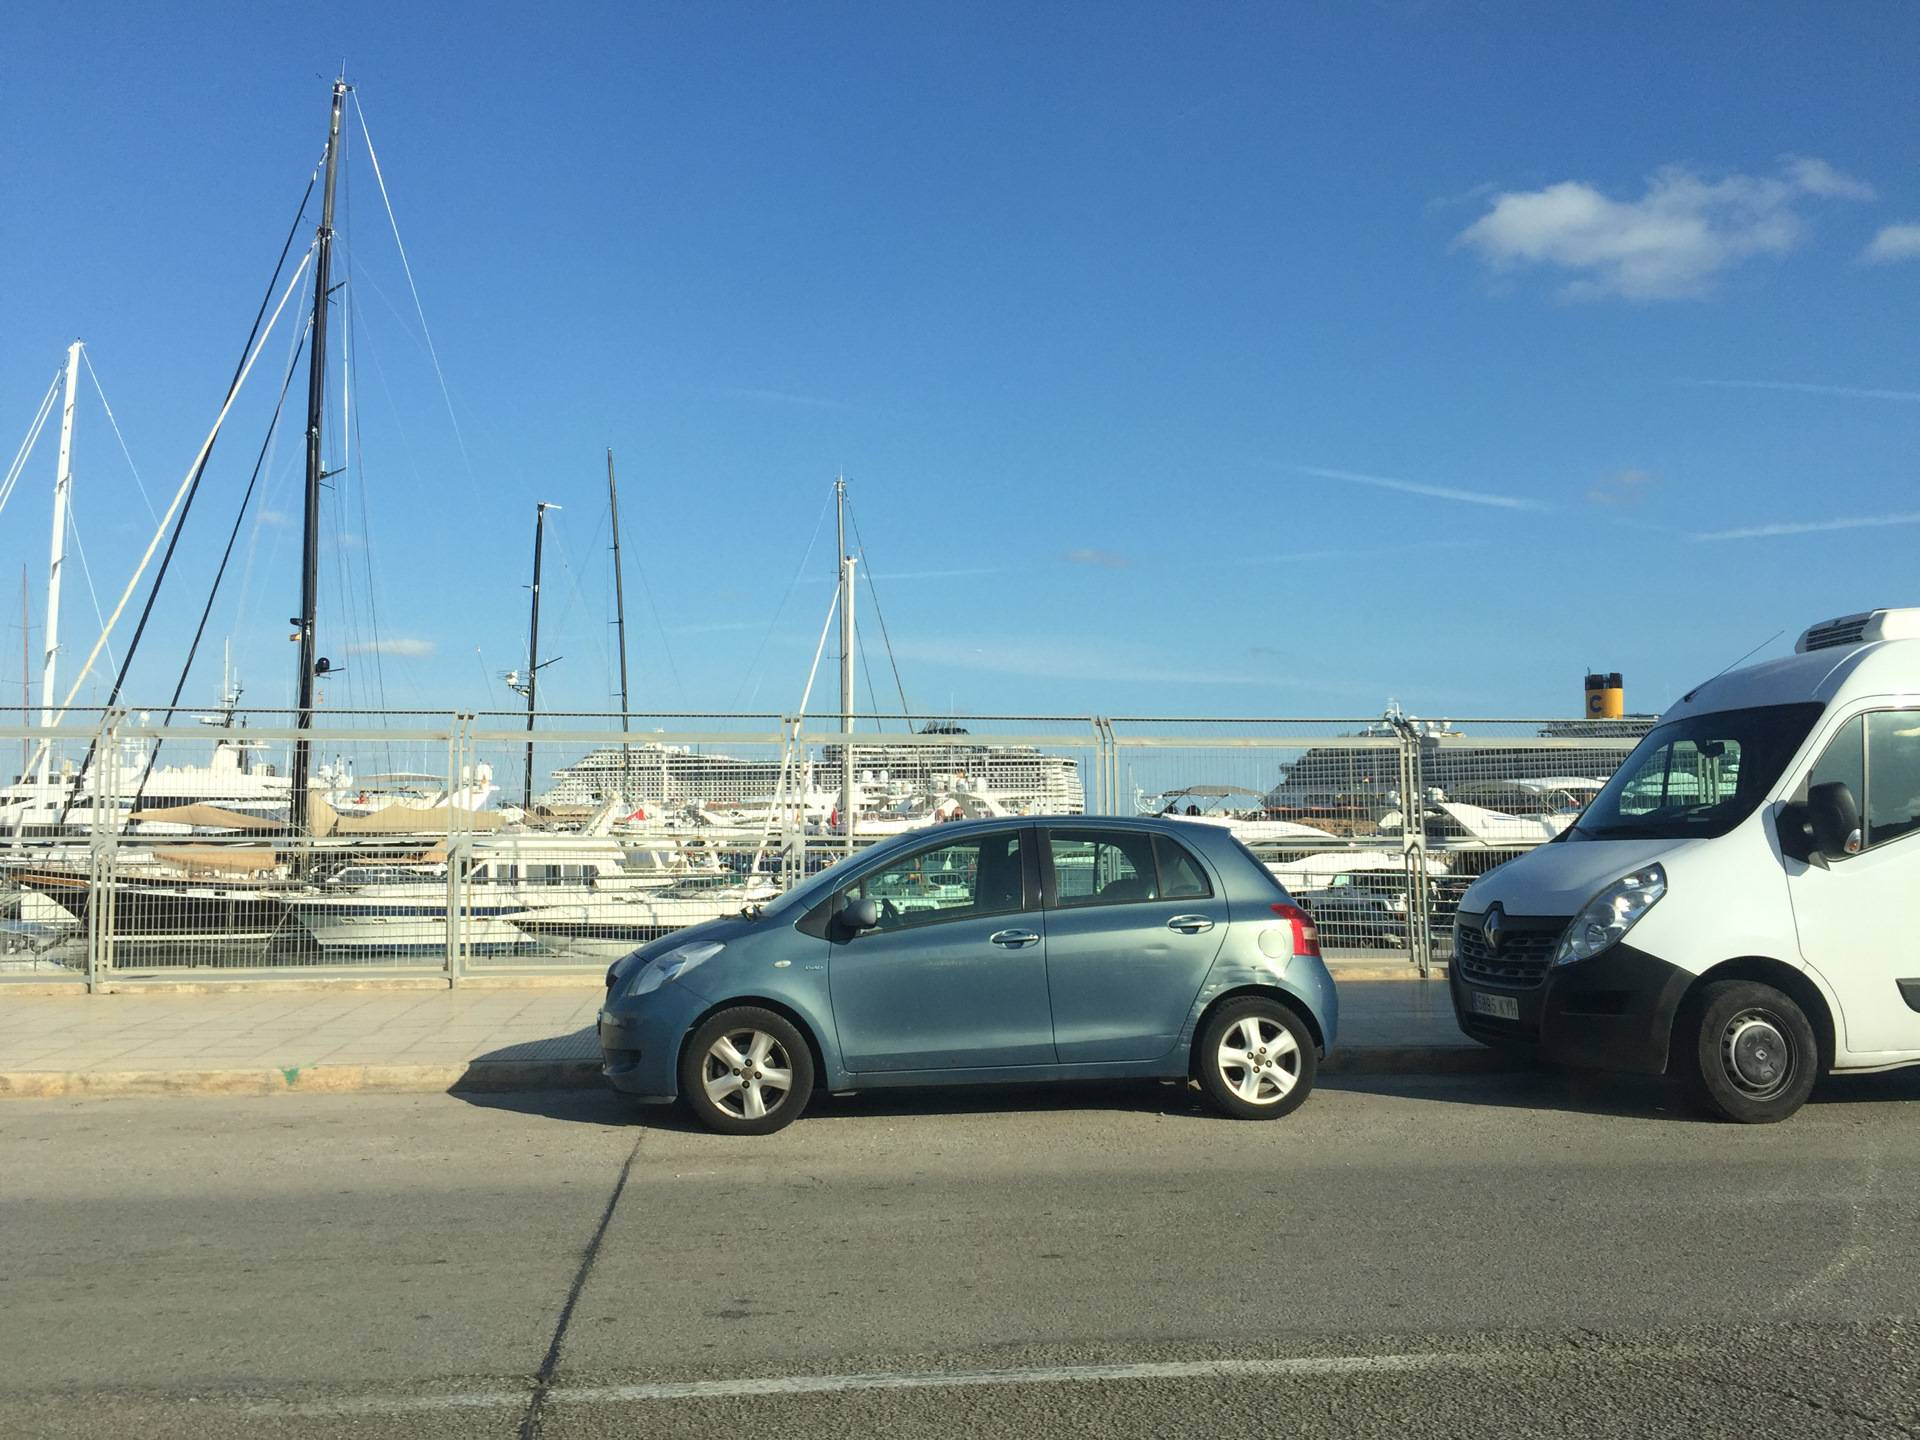 Аренда автомобиля, мальорка: прокат машин avis испания